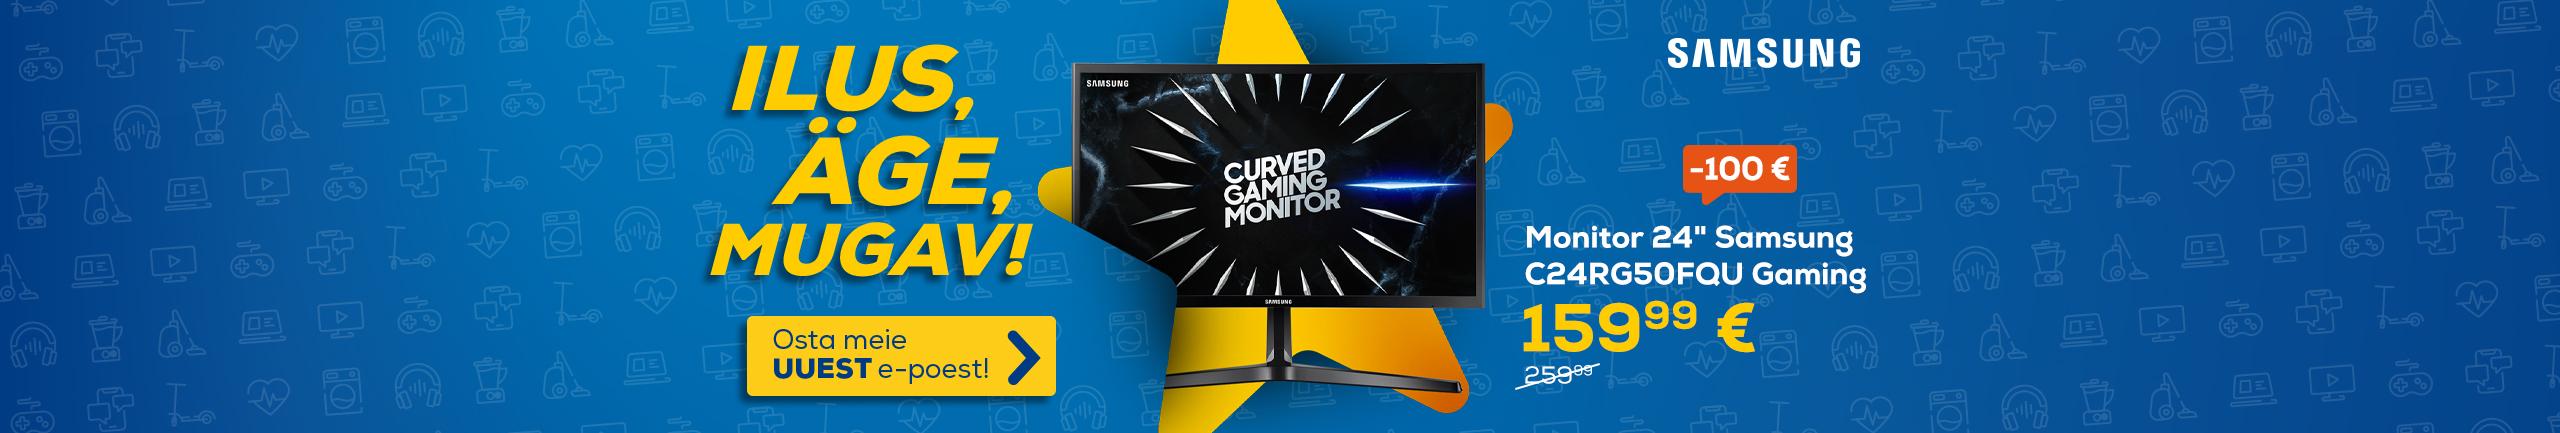 "FrontPageSlider Uuenenud Euronics e-poe eripakkumised Samsung Gamiung monitor 24"""